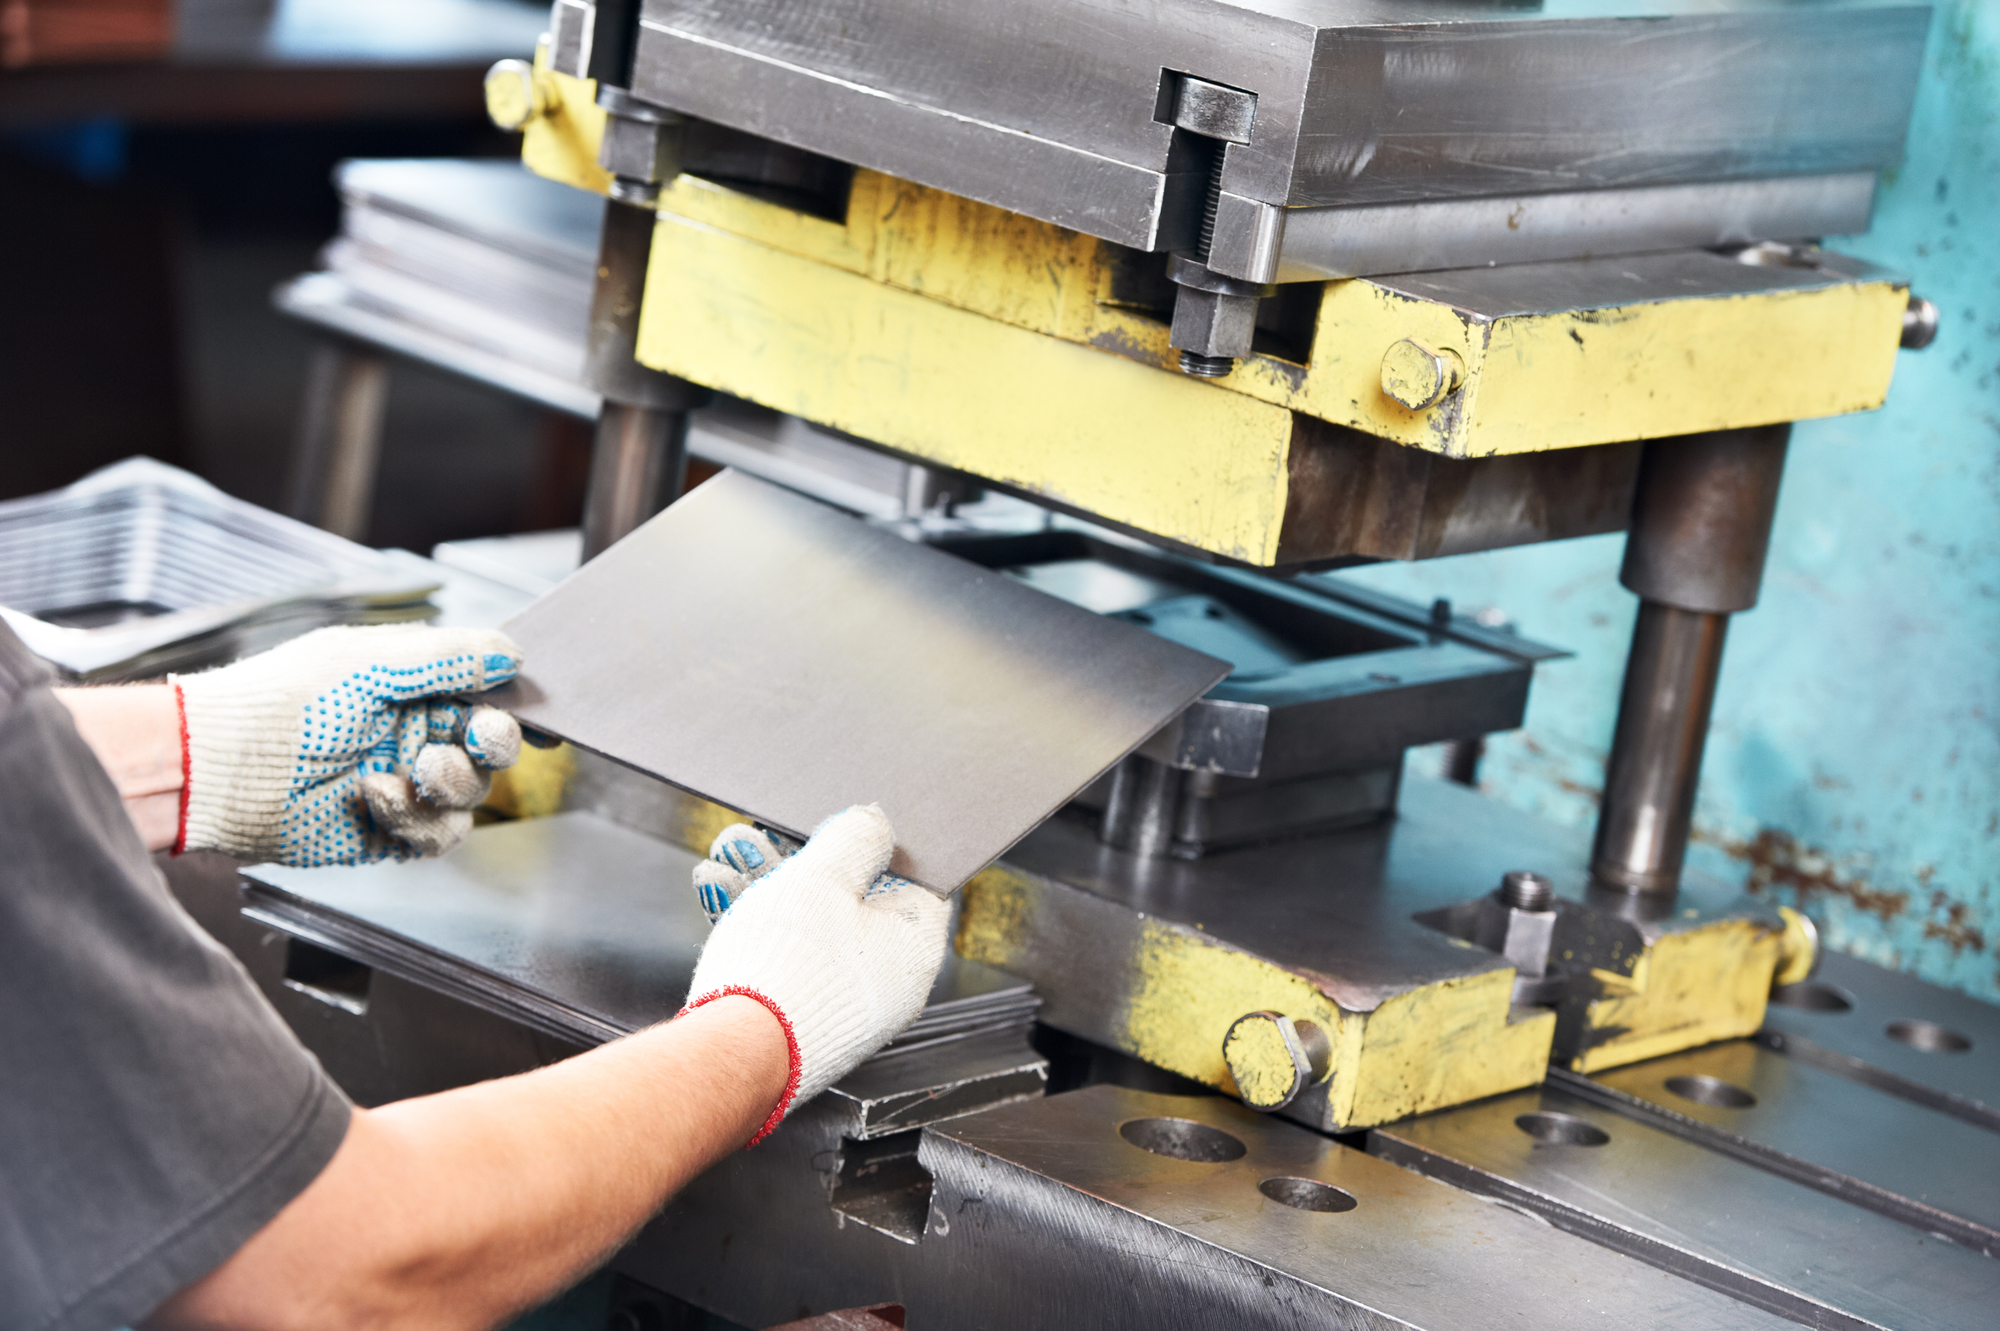 worker operating metal sheet press machine